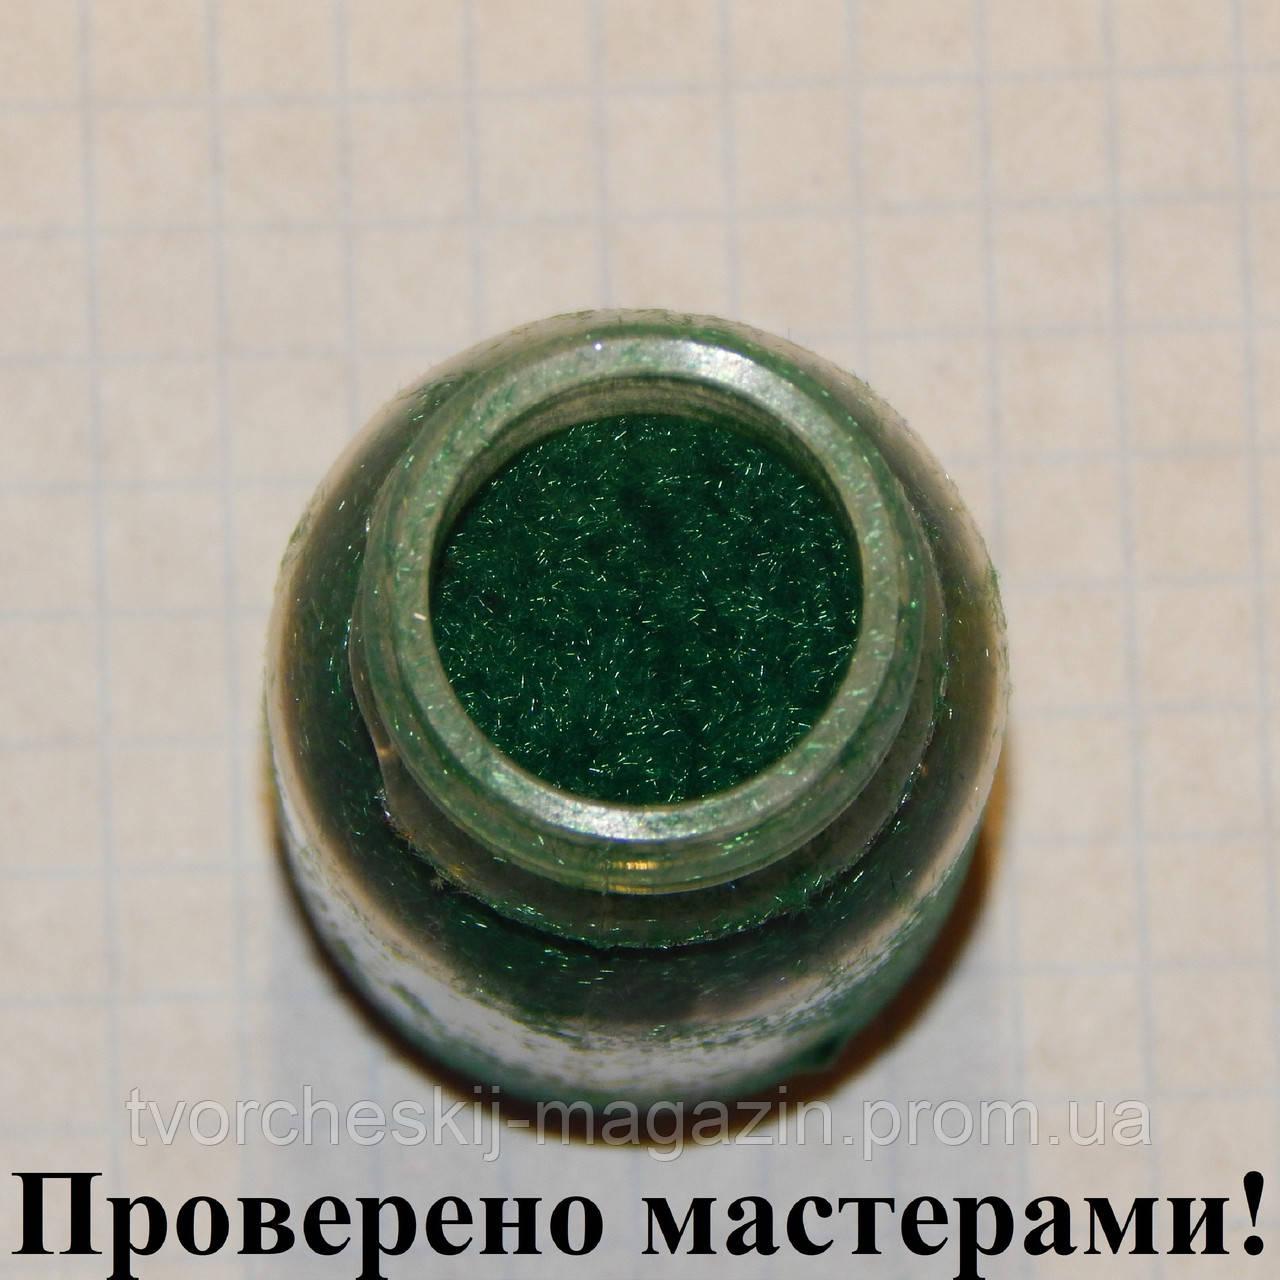 Флок зеленый, баночка 20 мл